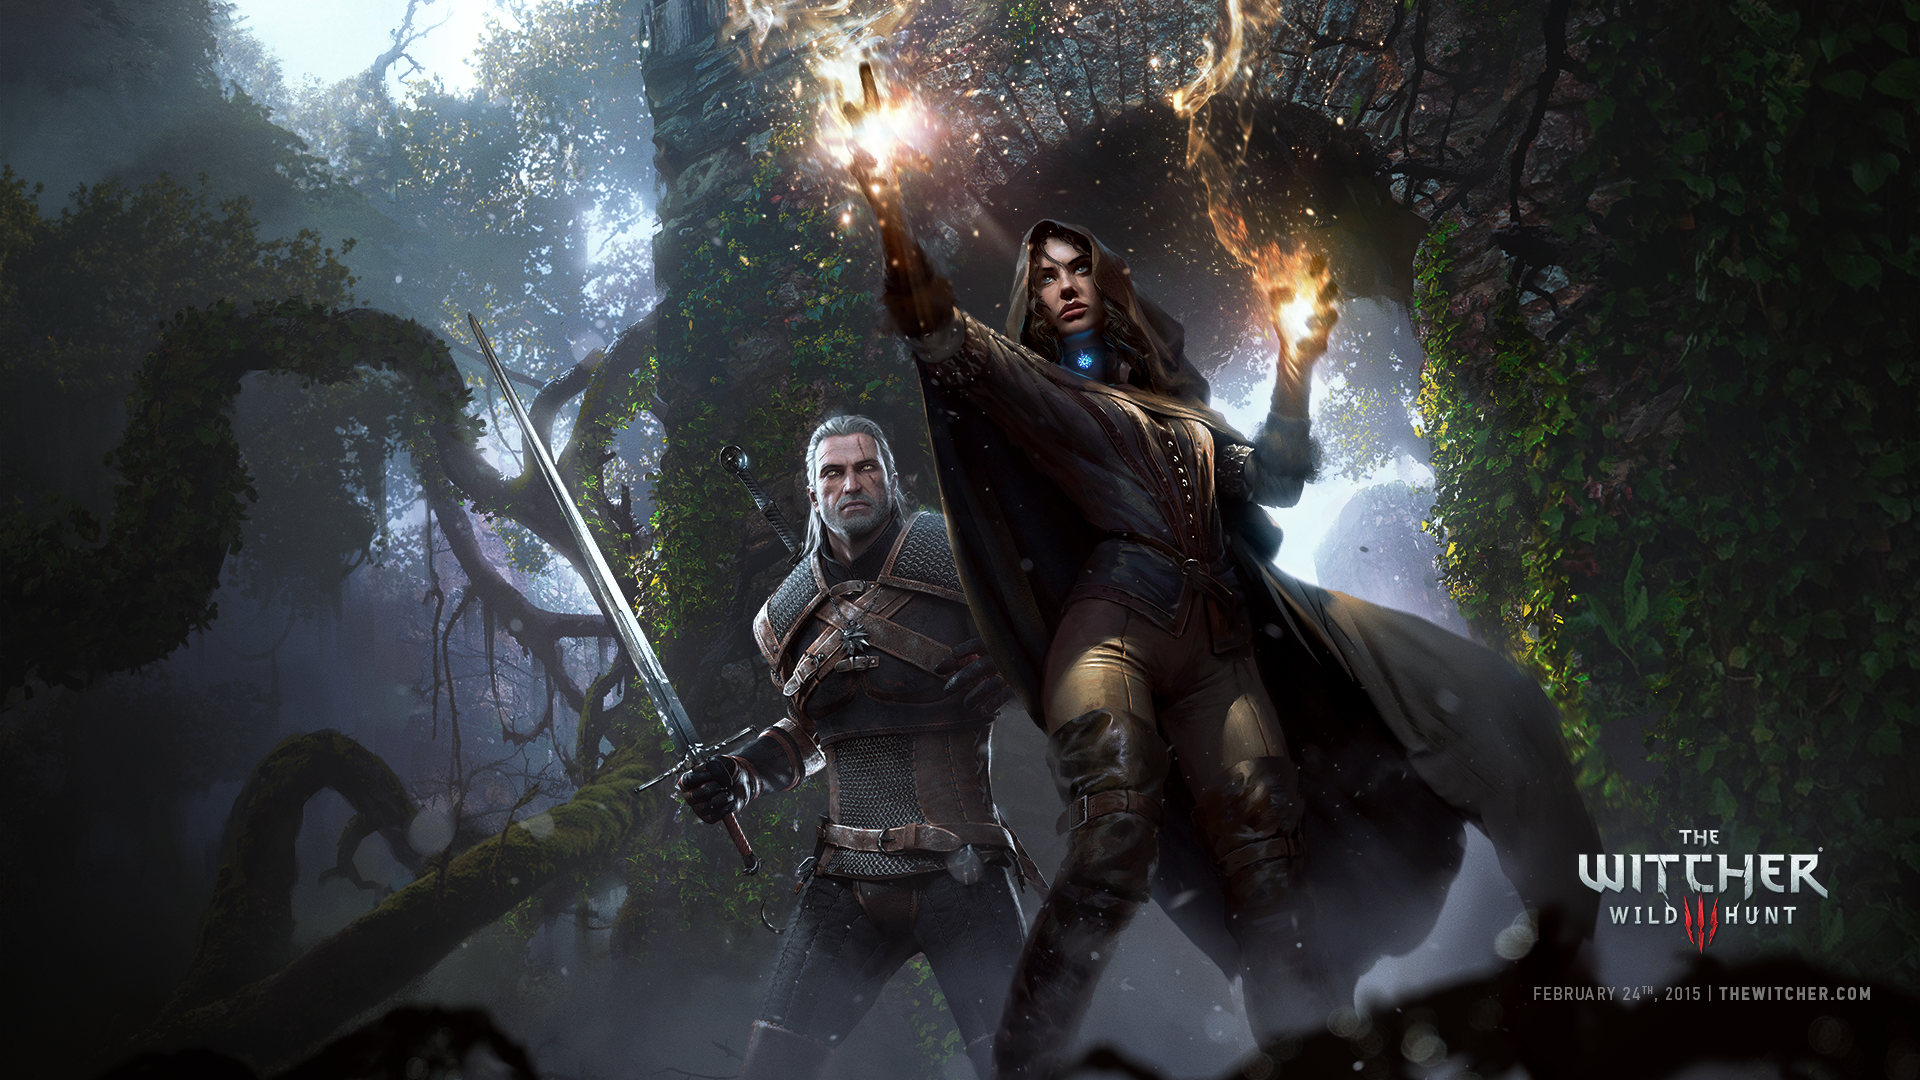 Geralt gleda Yennefer straga 1920x1080